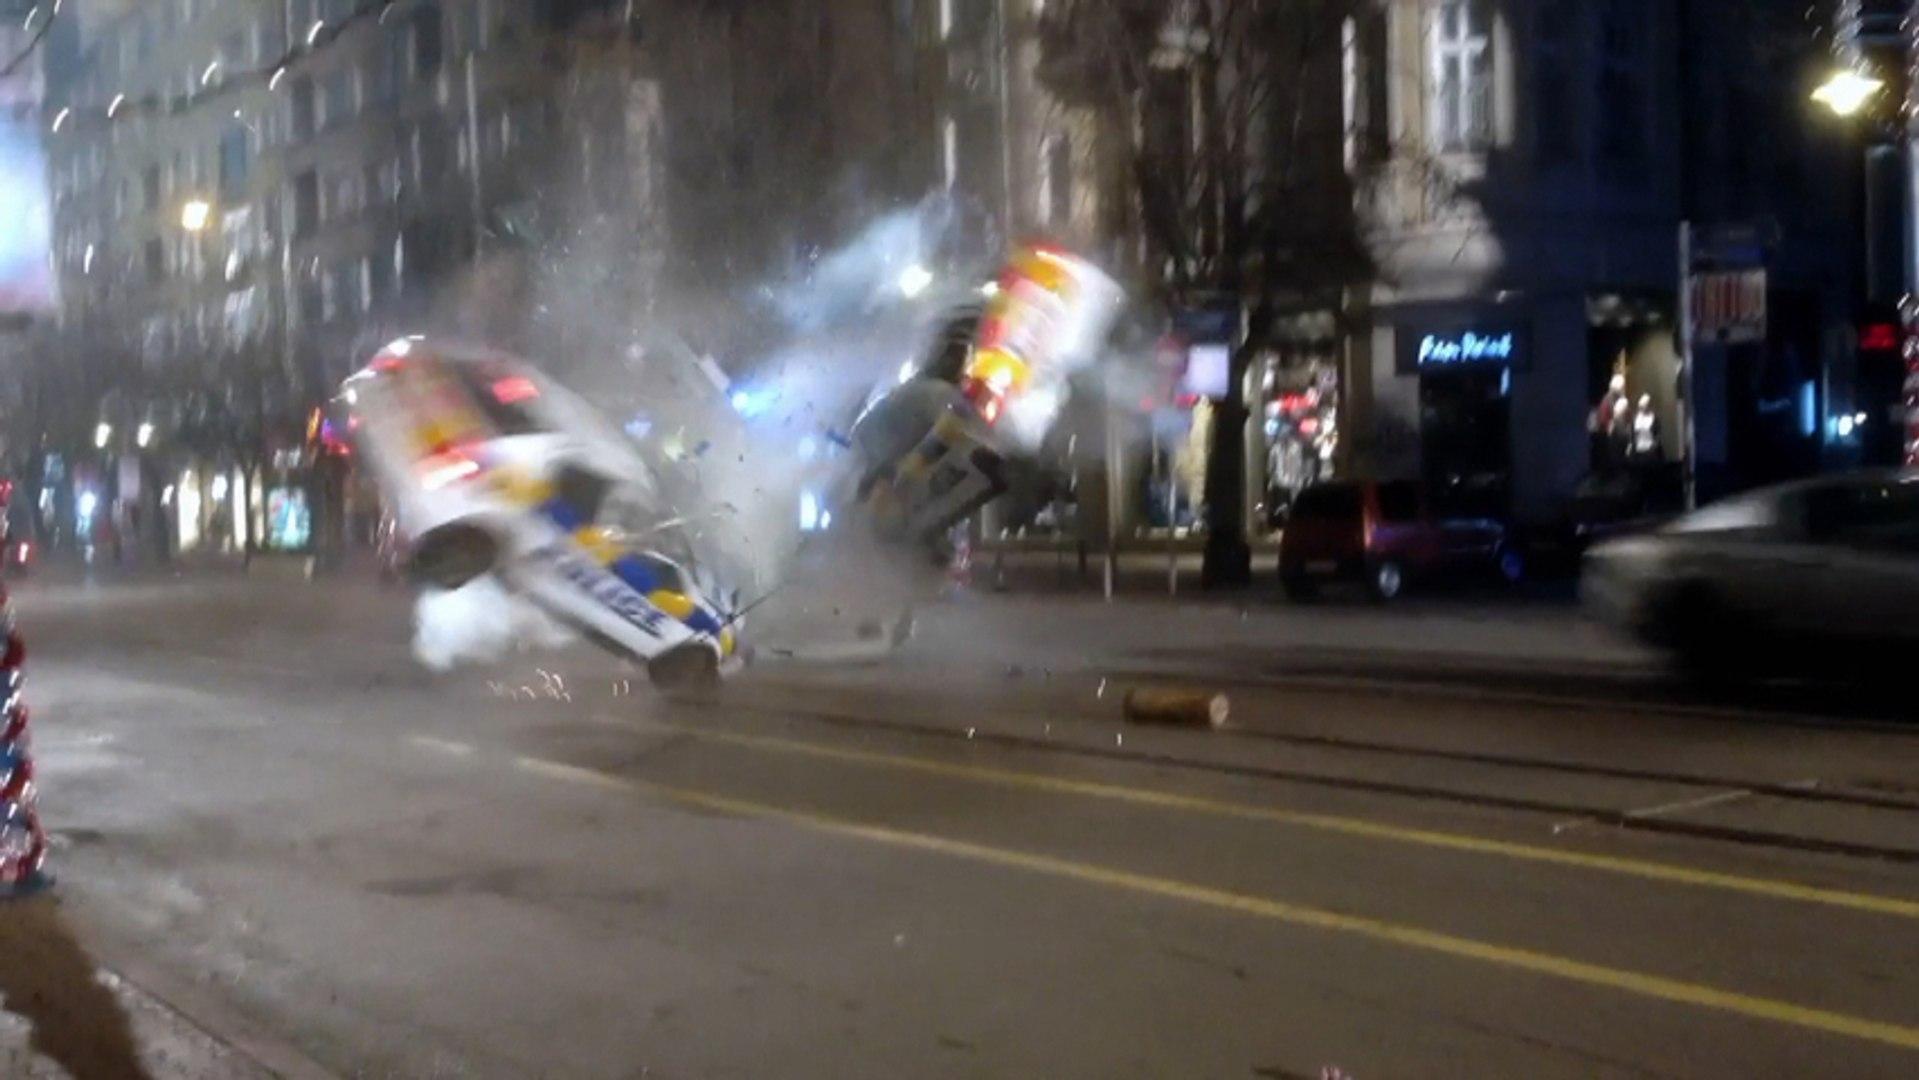 Selena Gomez And Ethan Hawke In Dangerous Crash Scene